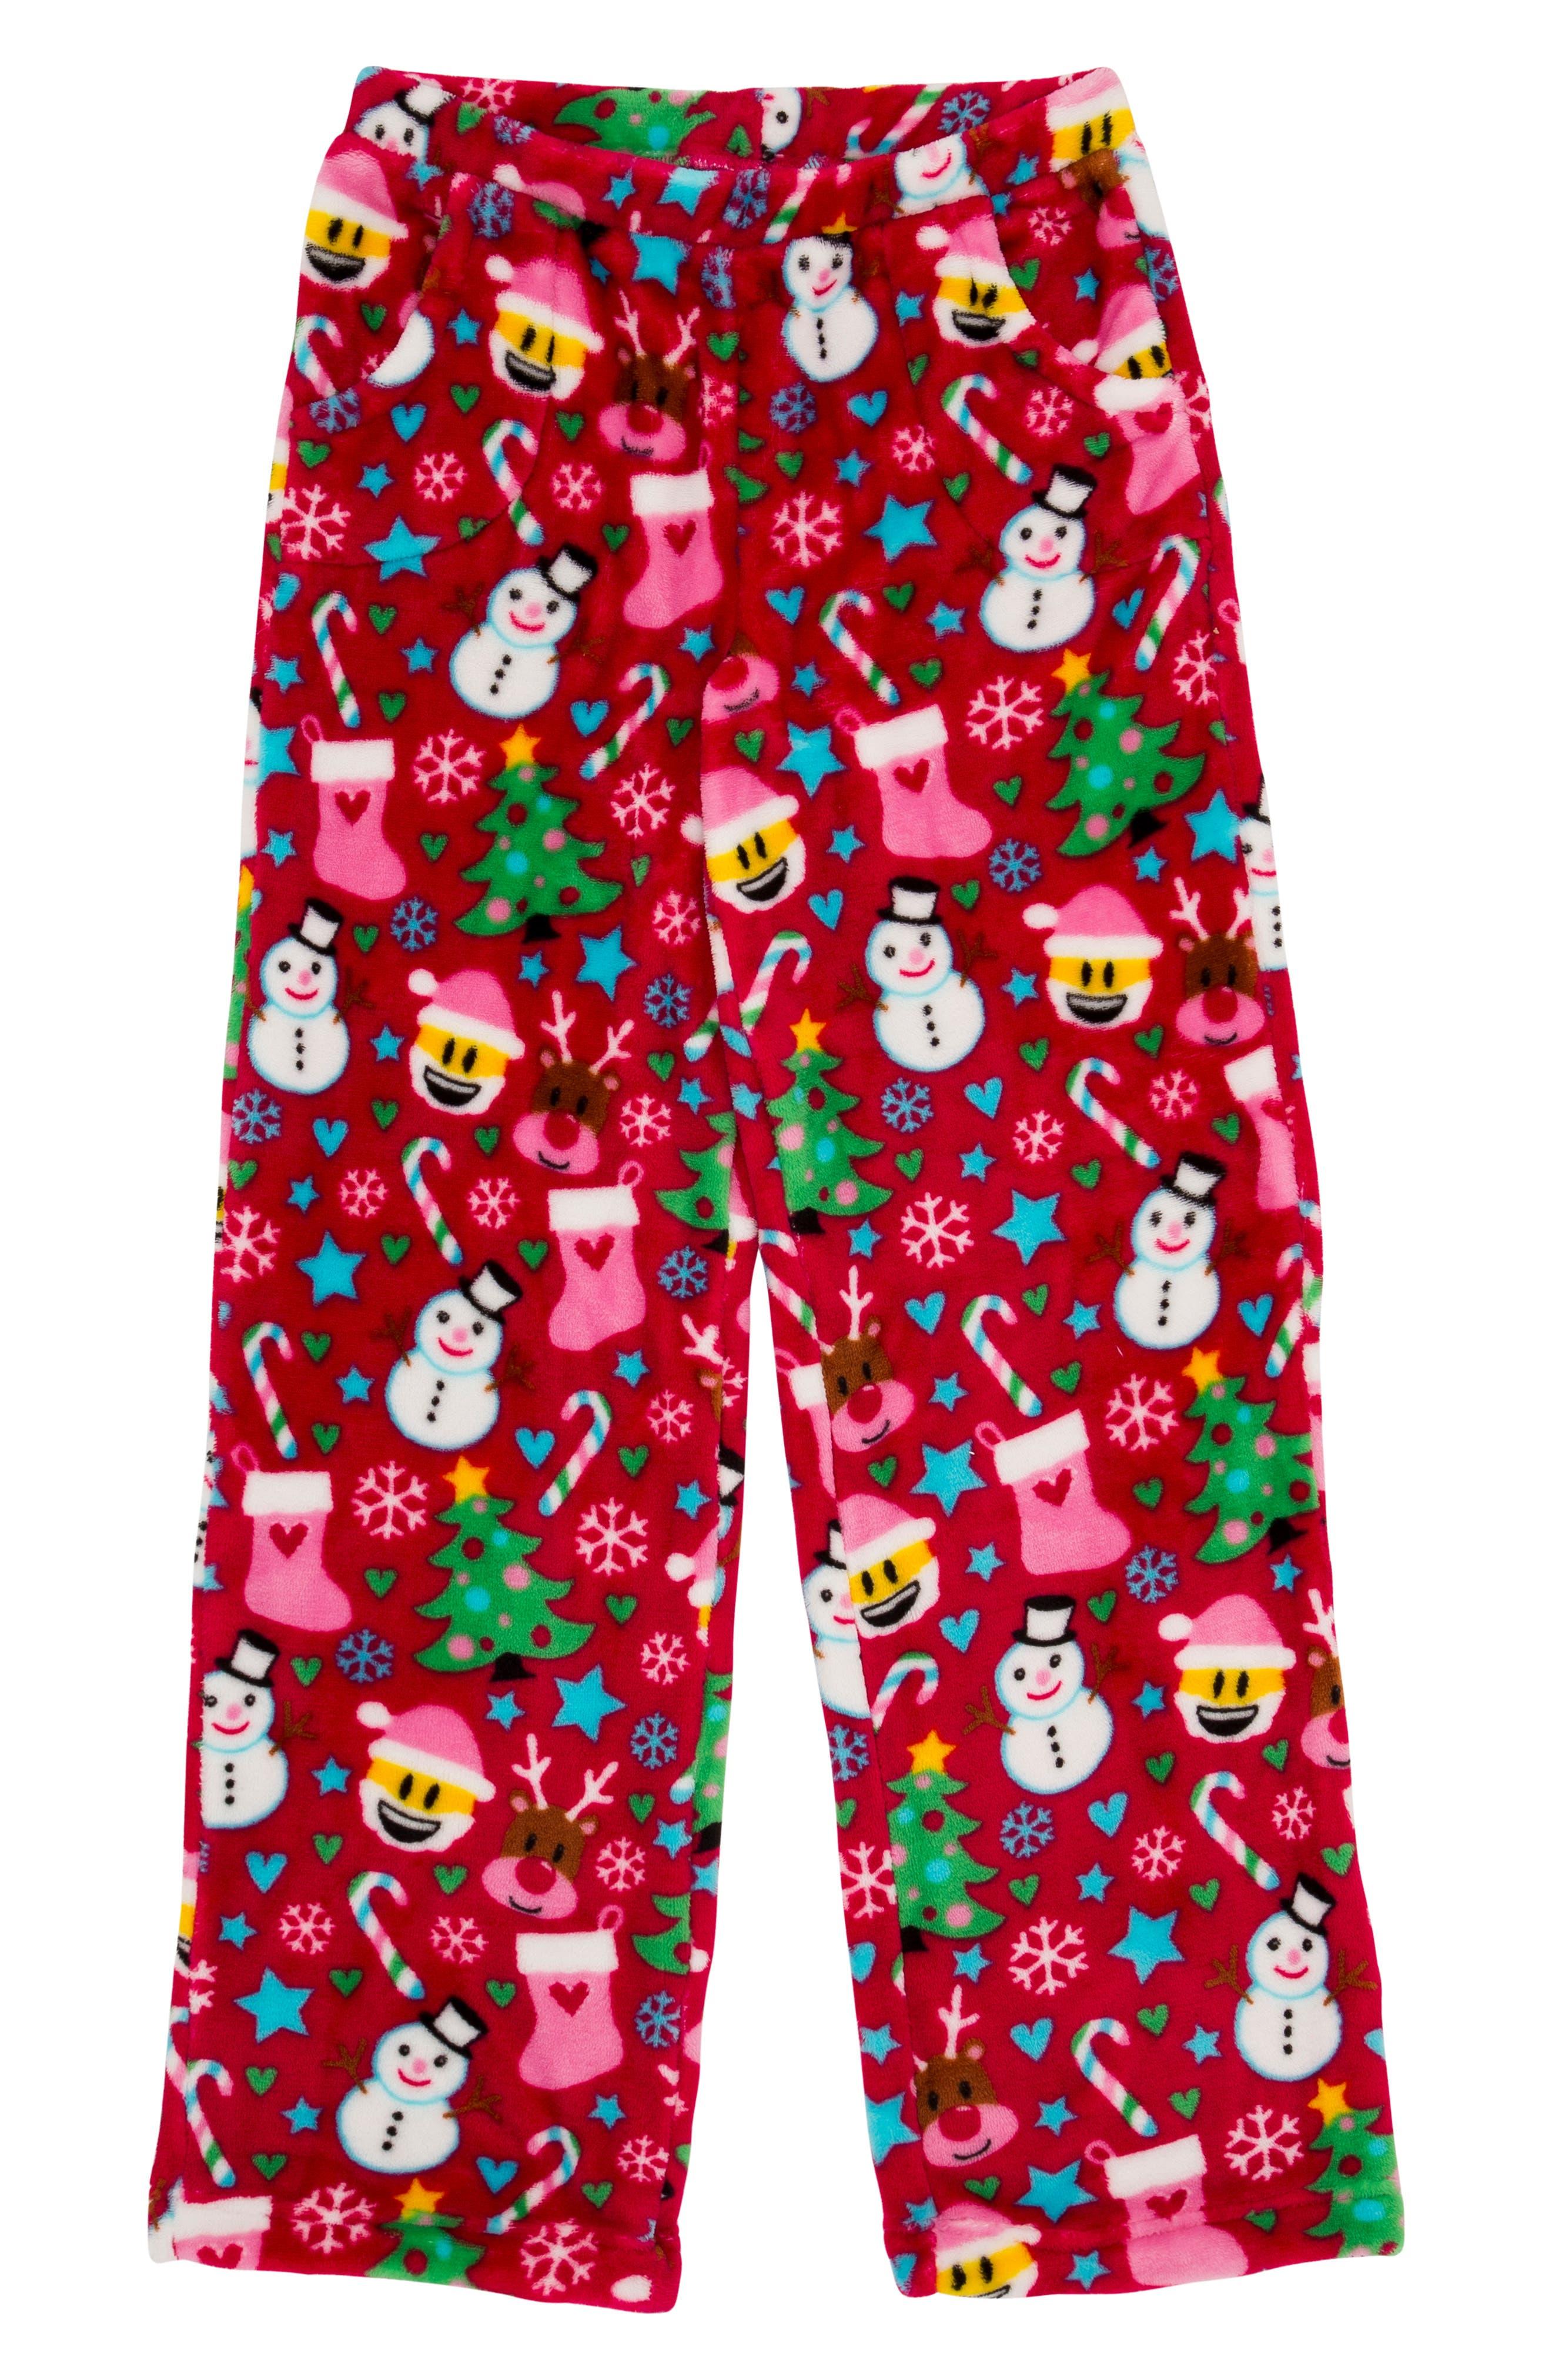 Holiday Fleece Pajama Pants,                             Main thumbnail 1, color,                             600